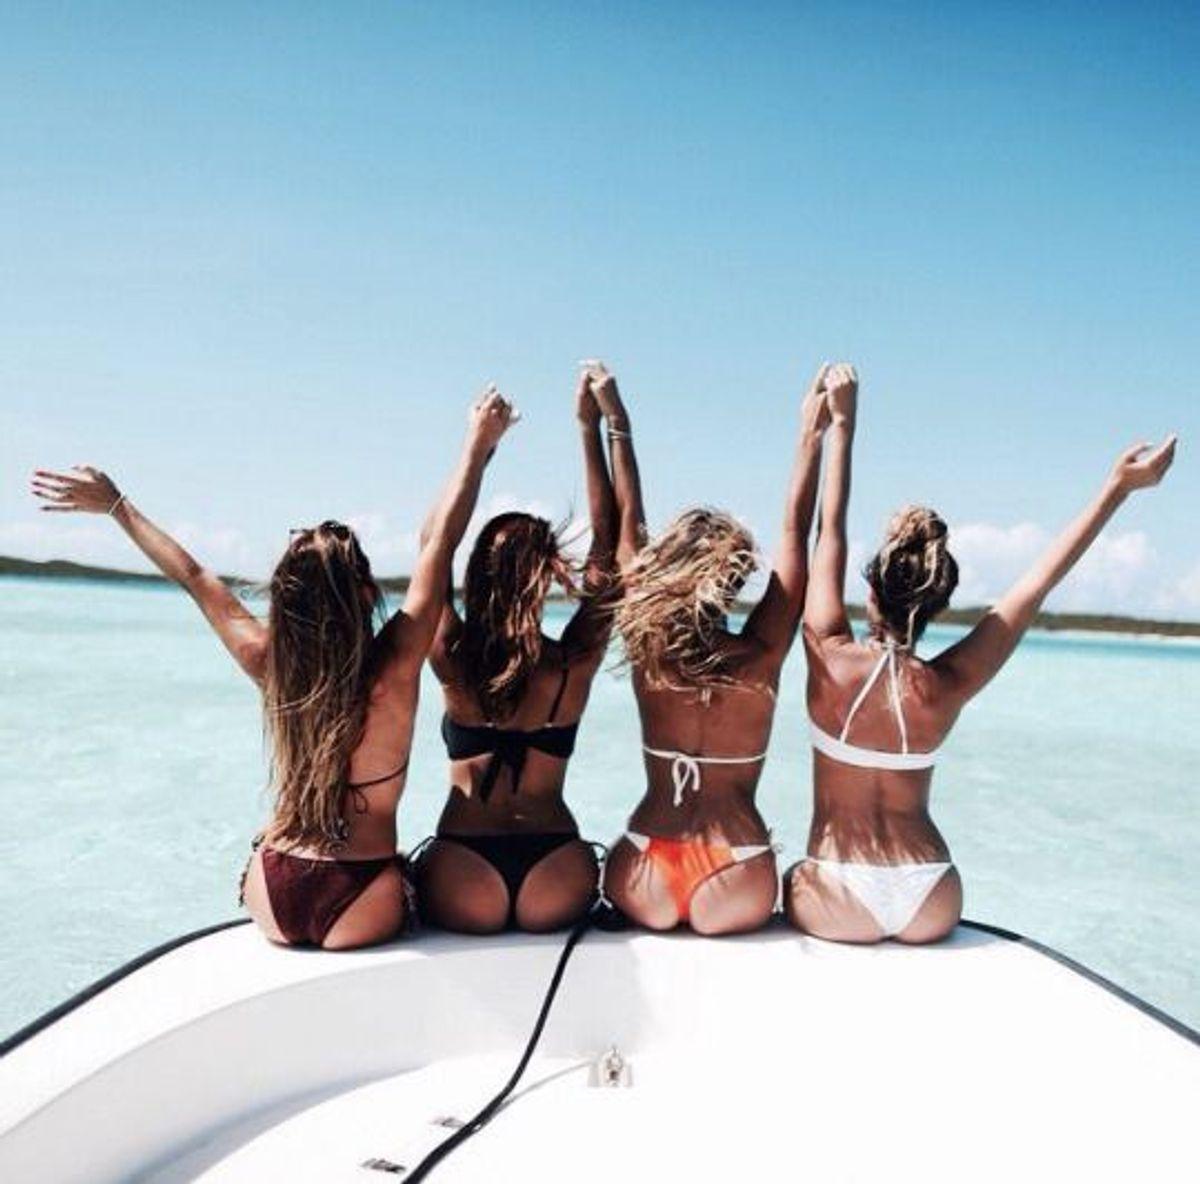 Summer Break: Expectations vs. Reality